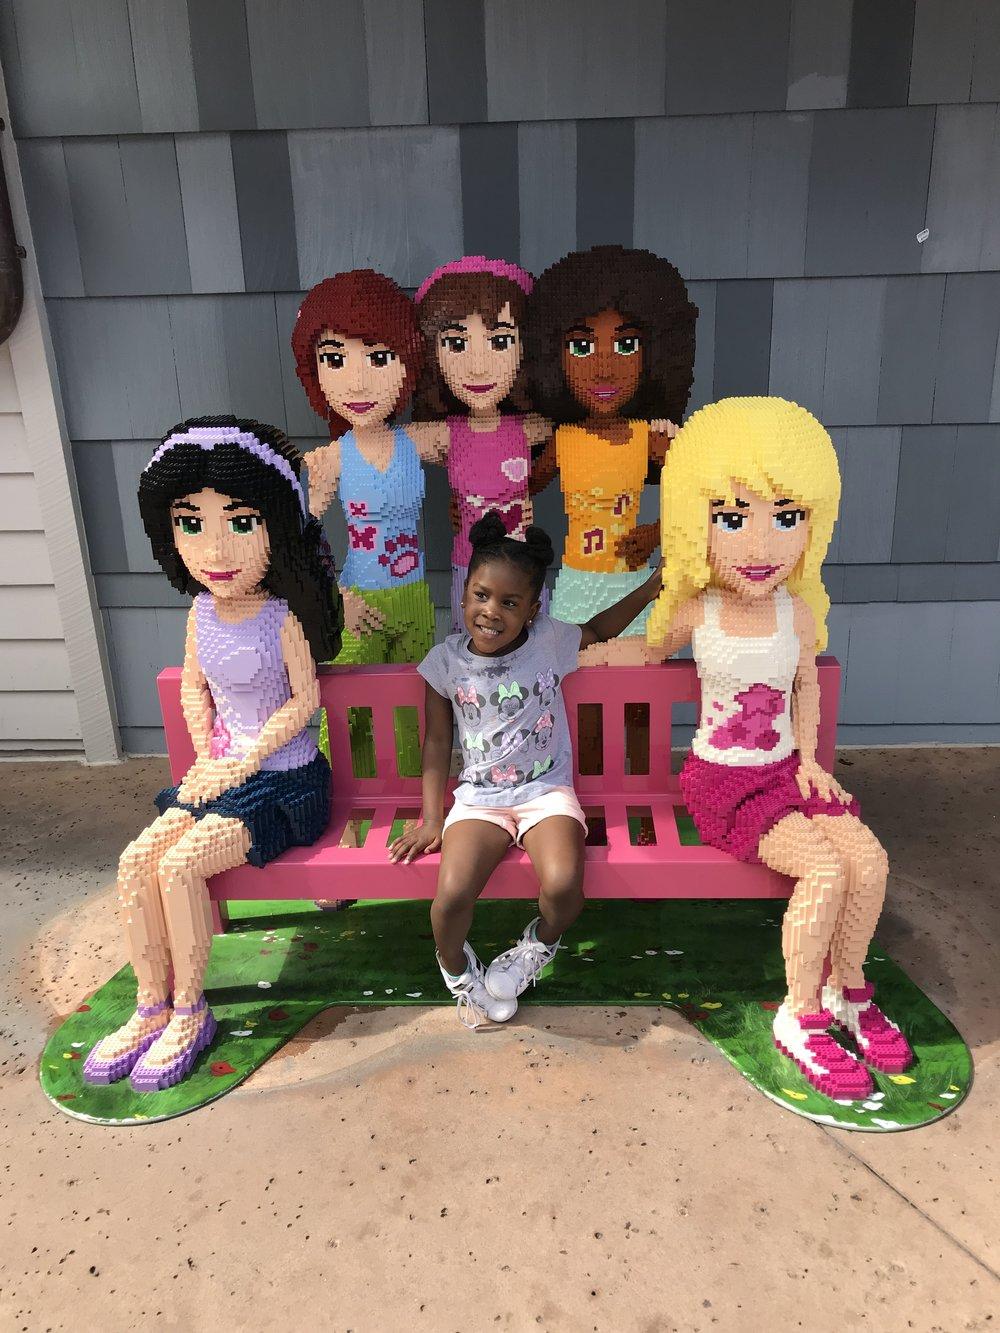 Aria with Lego girls .jpg